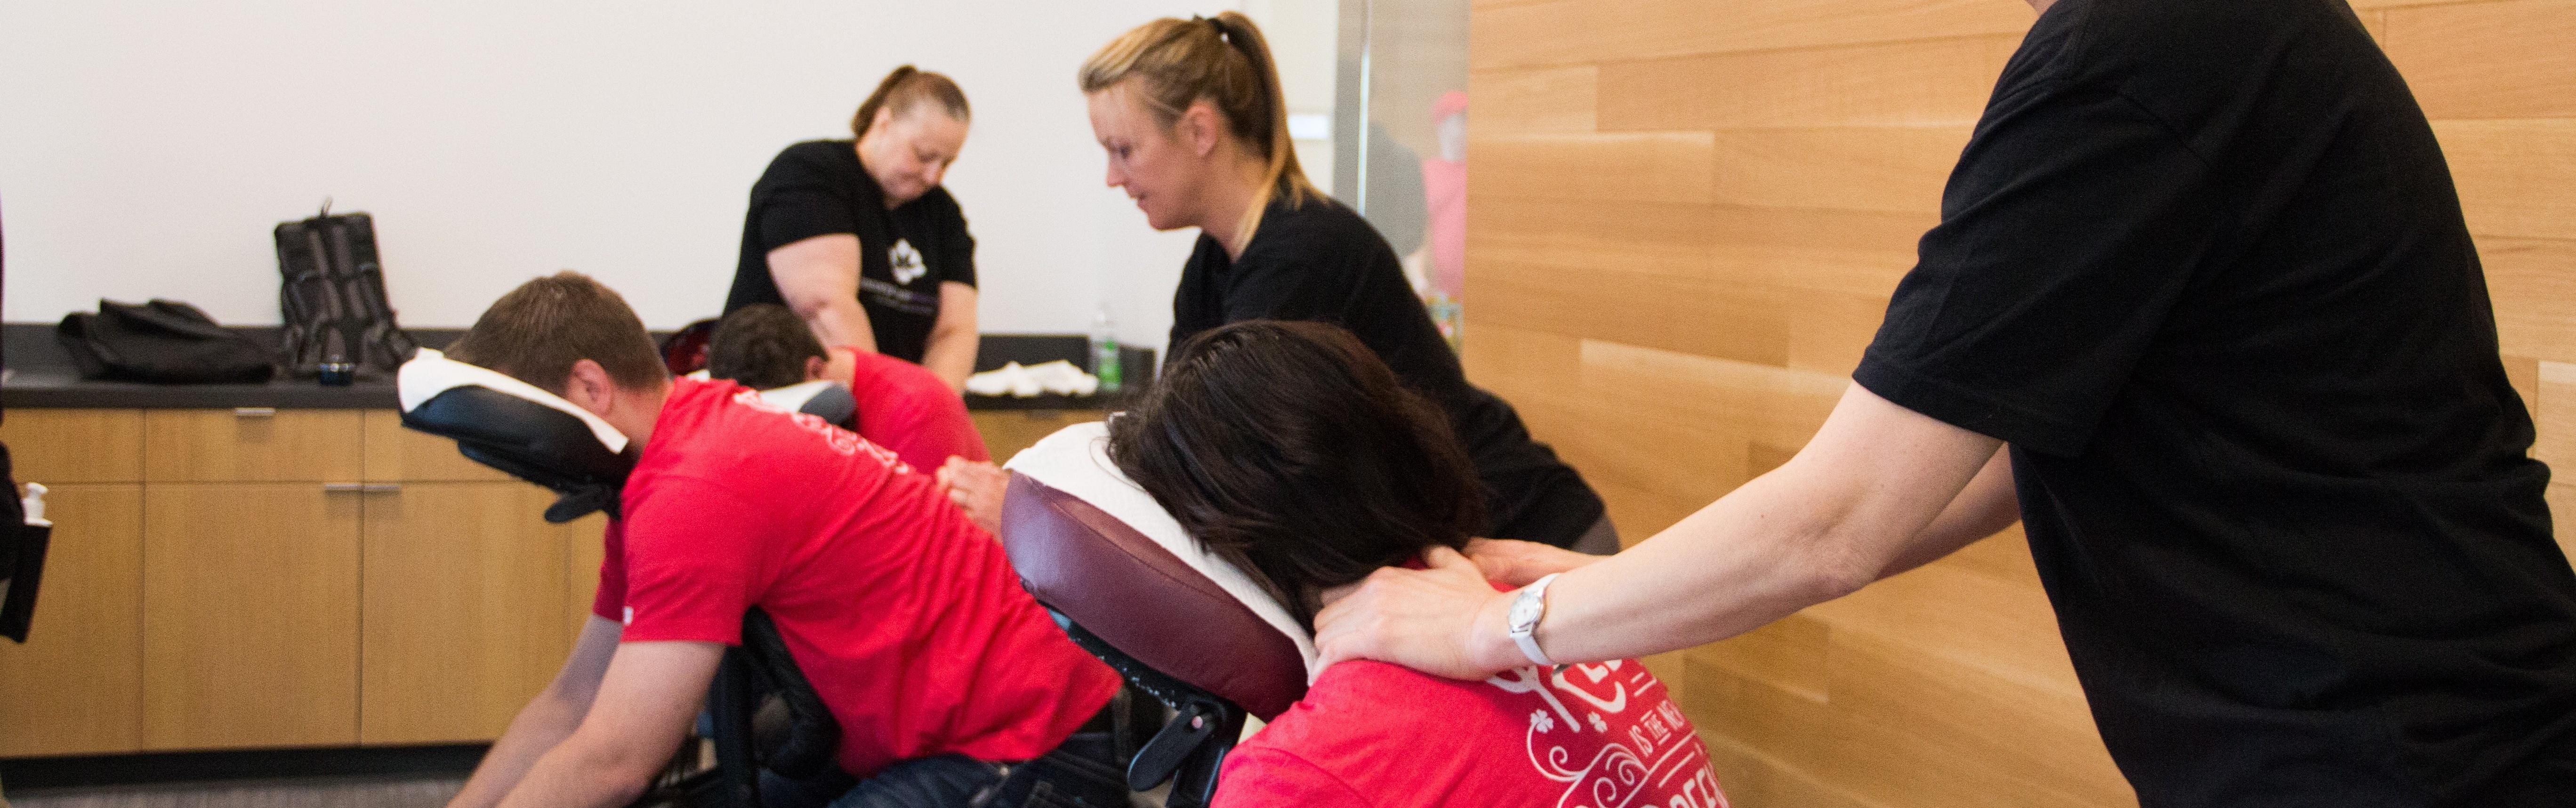 Wellness Program Massage